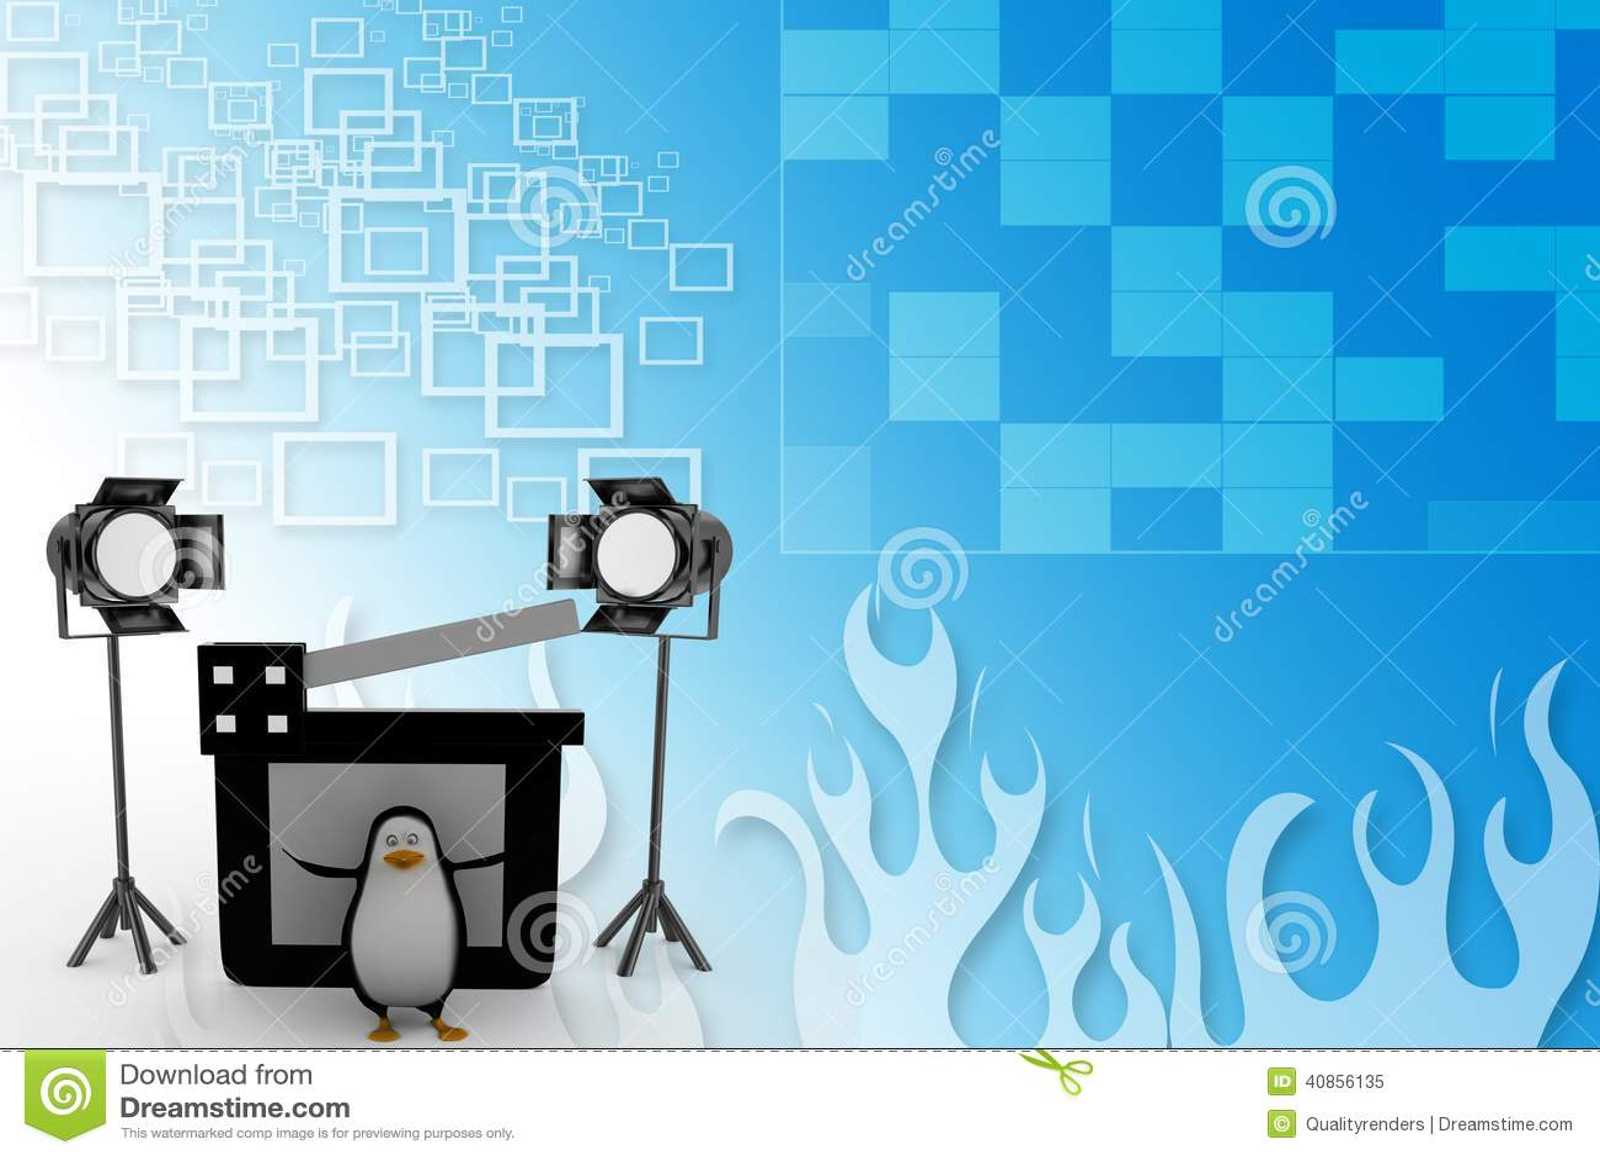 3d Penguin With Studio light ,movie clapper on a film reel illustration